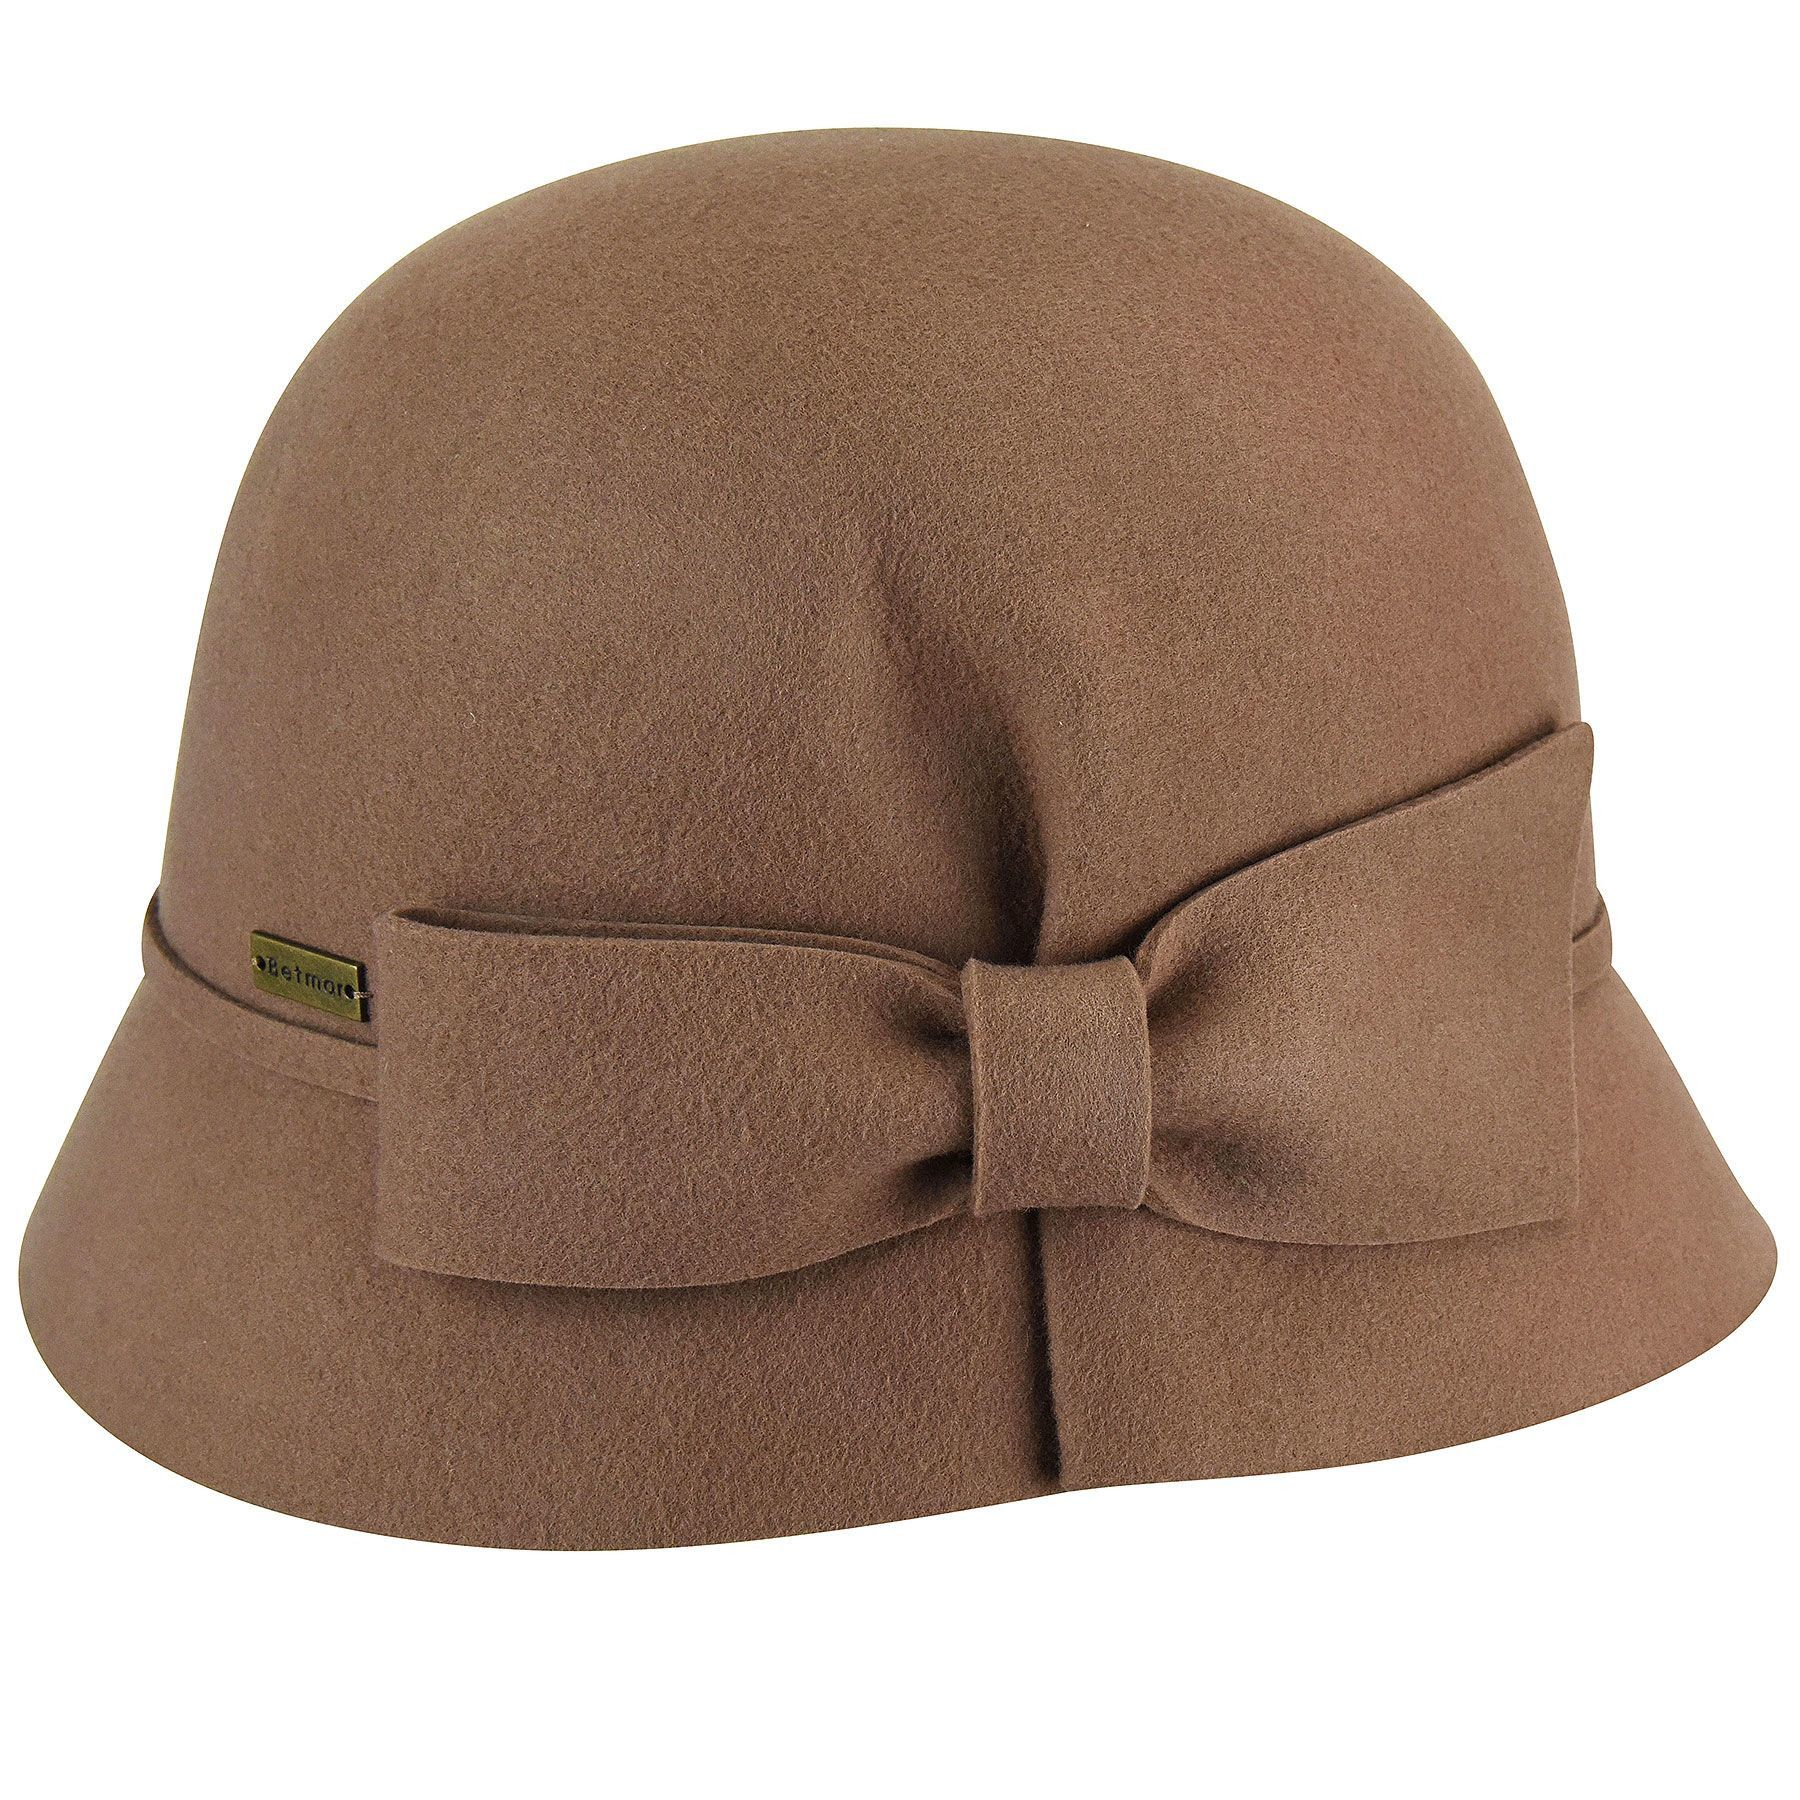 Betmar Dixie kalap